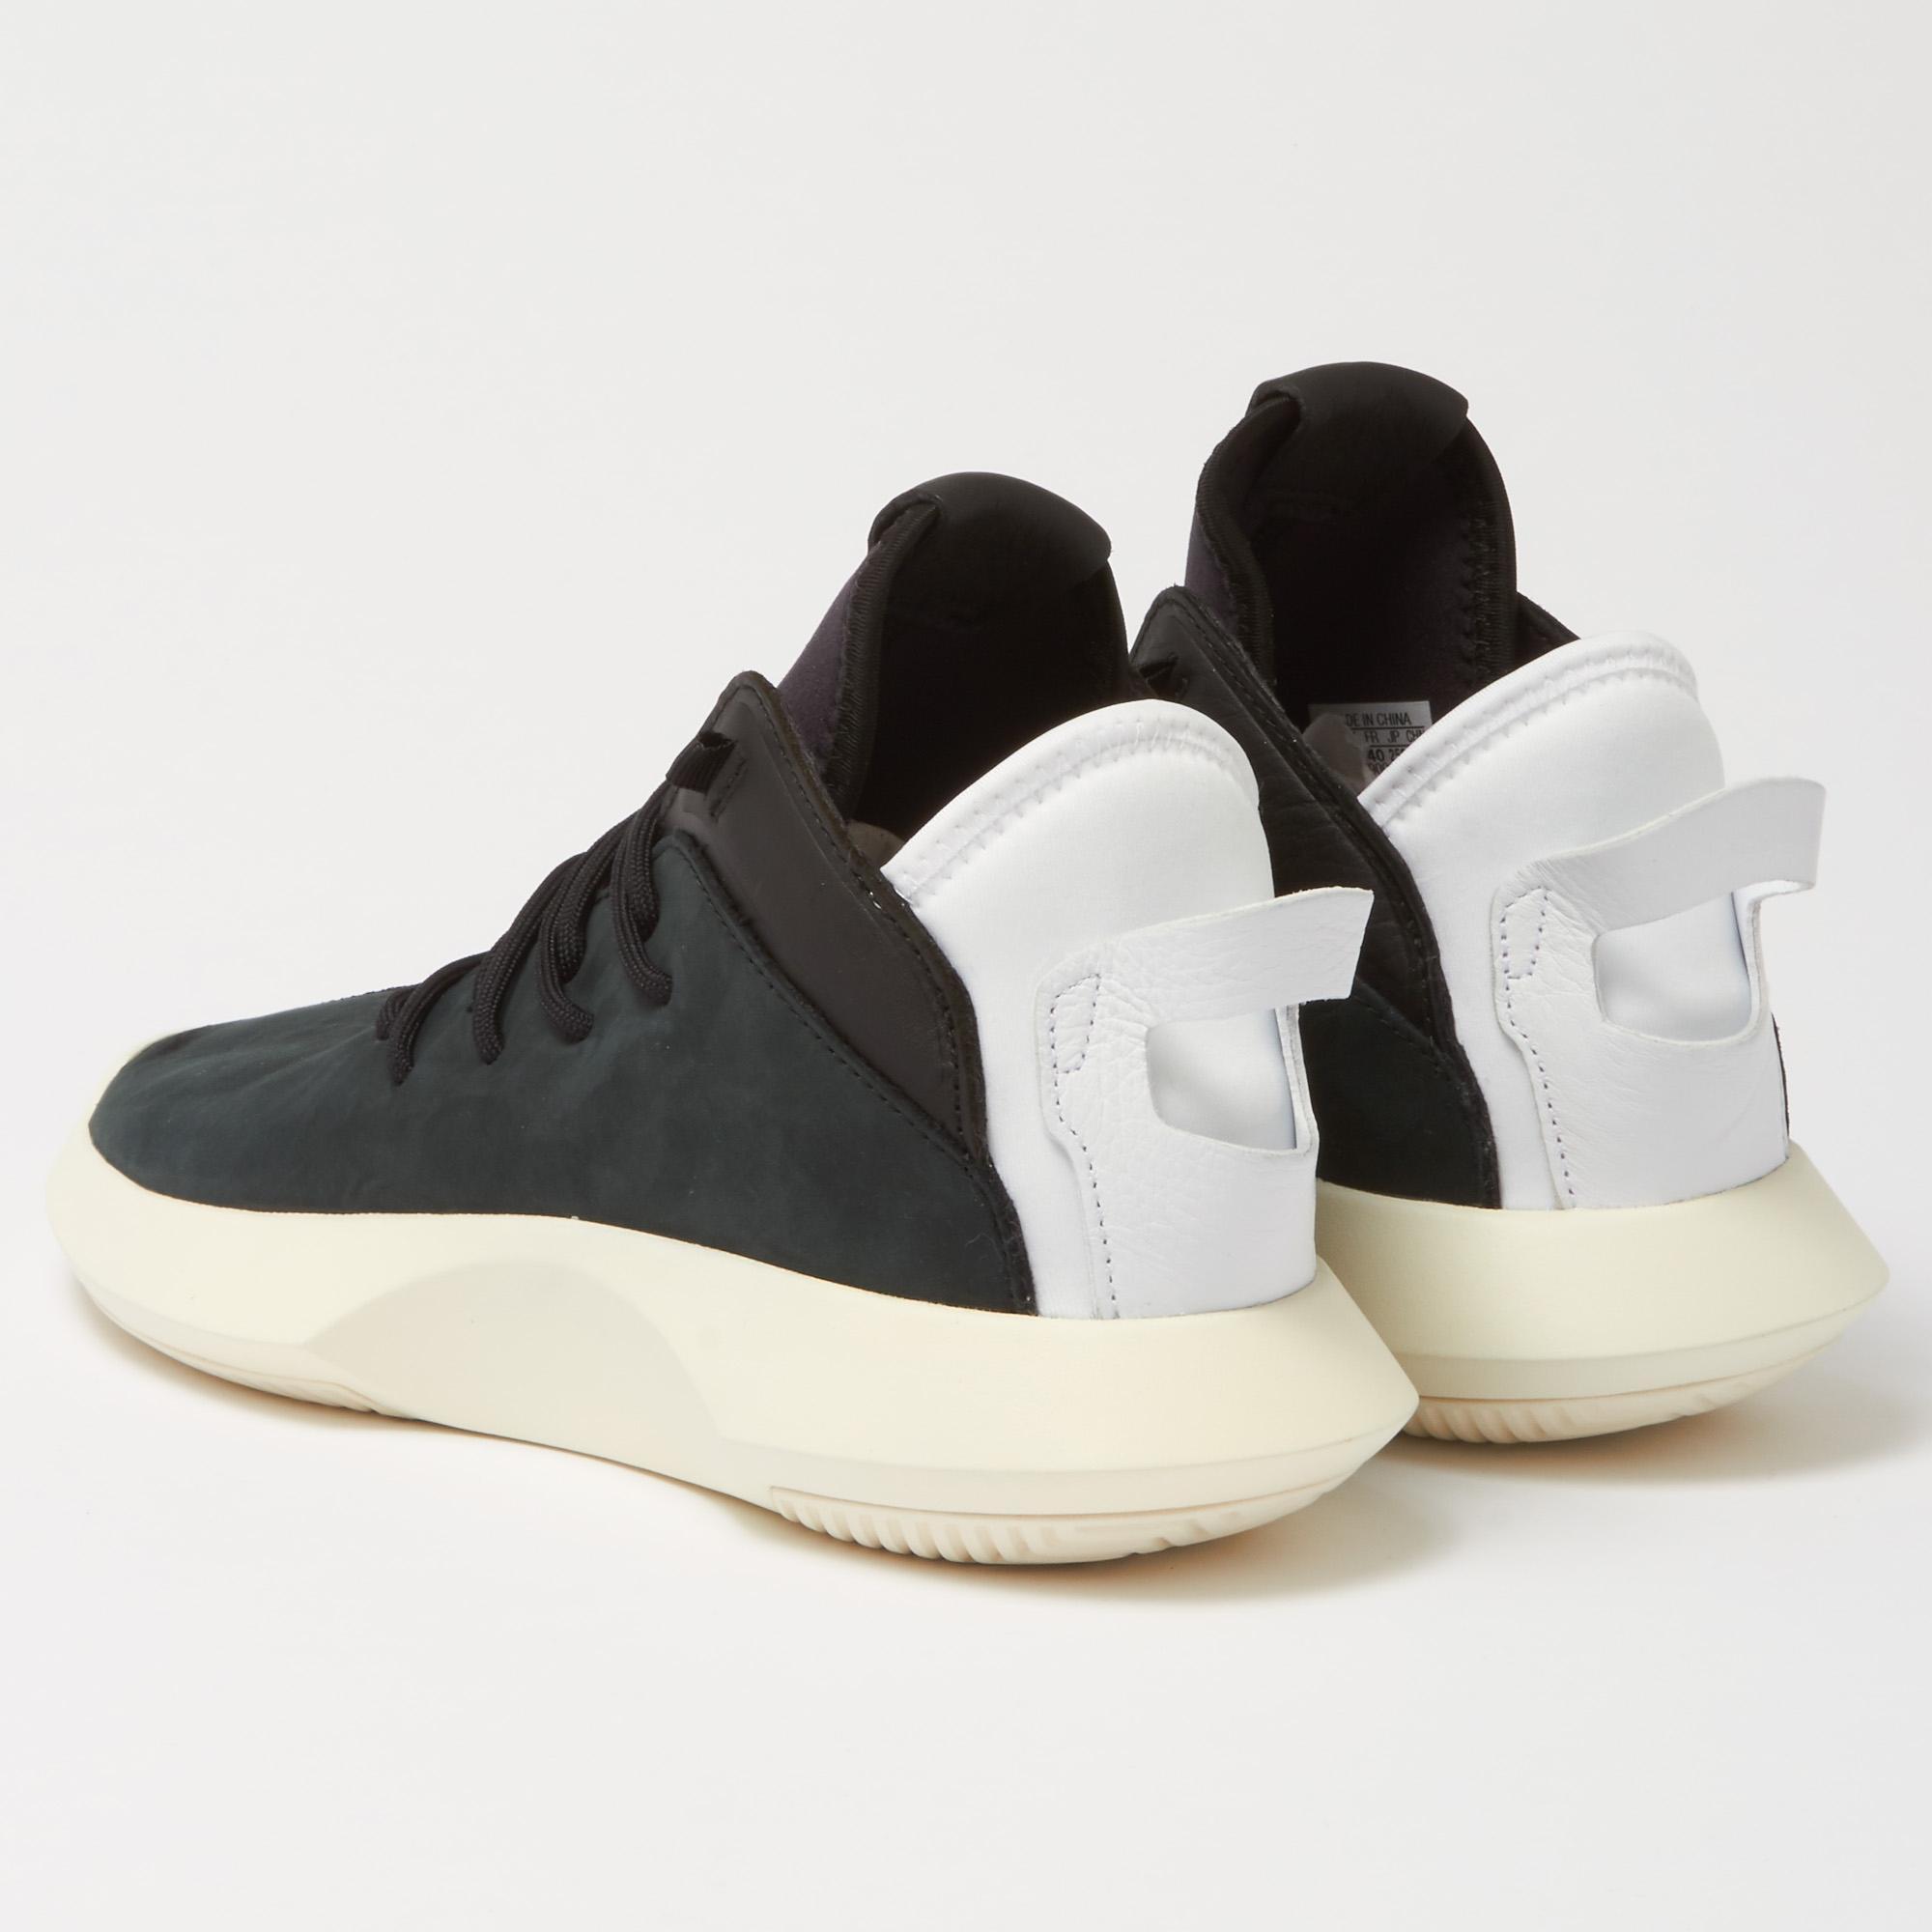 2964ee806321 Adidas Originals - Crazy 1 Adv - Core Black   Ftwr White for Men - Lyst.  View fullscreen